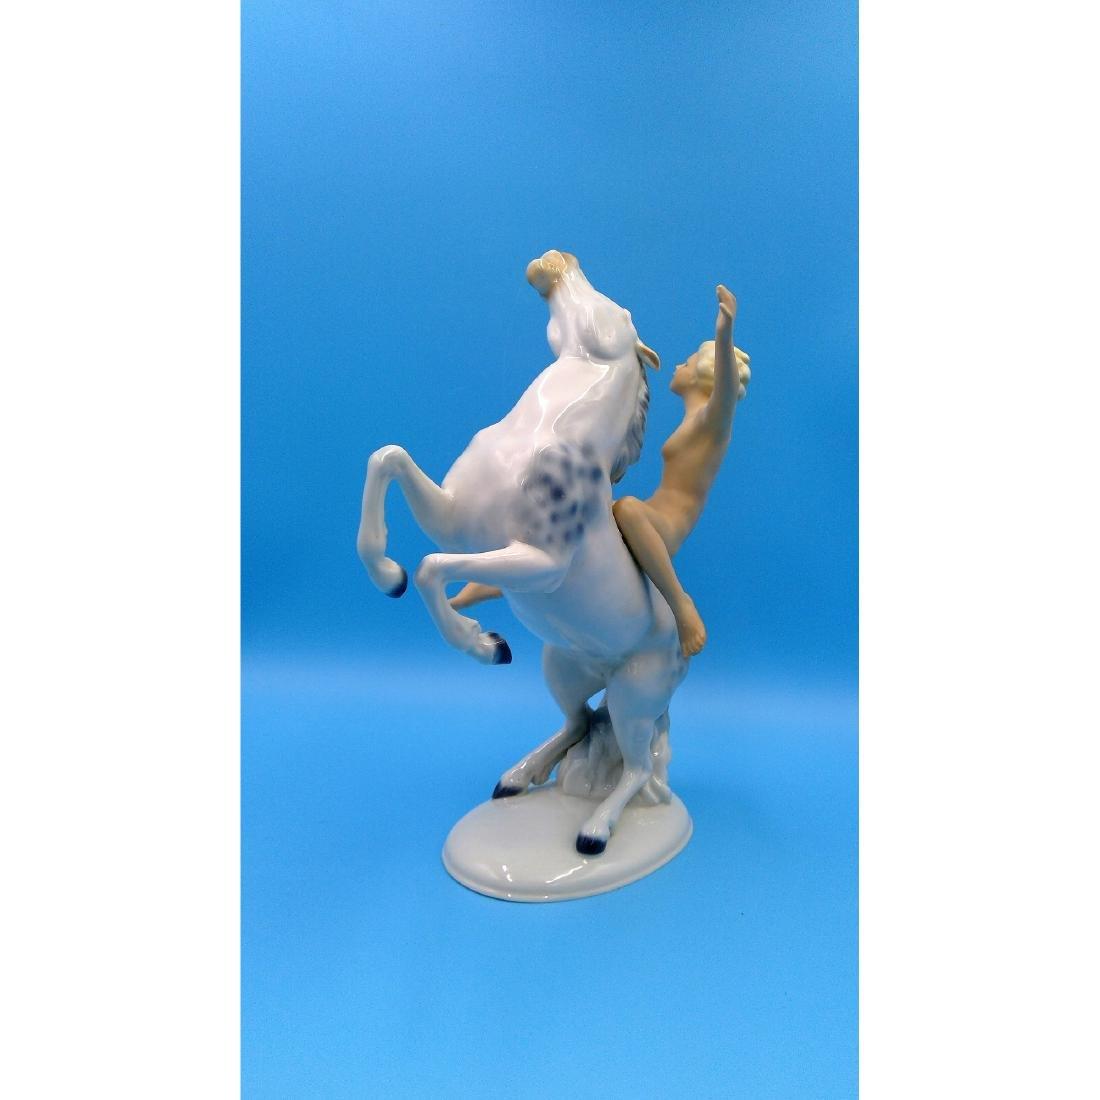 WALLENDORF GERMAN PORCELAIN NUDE ON HORSE FIGURE - 2